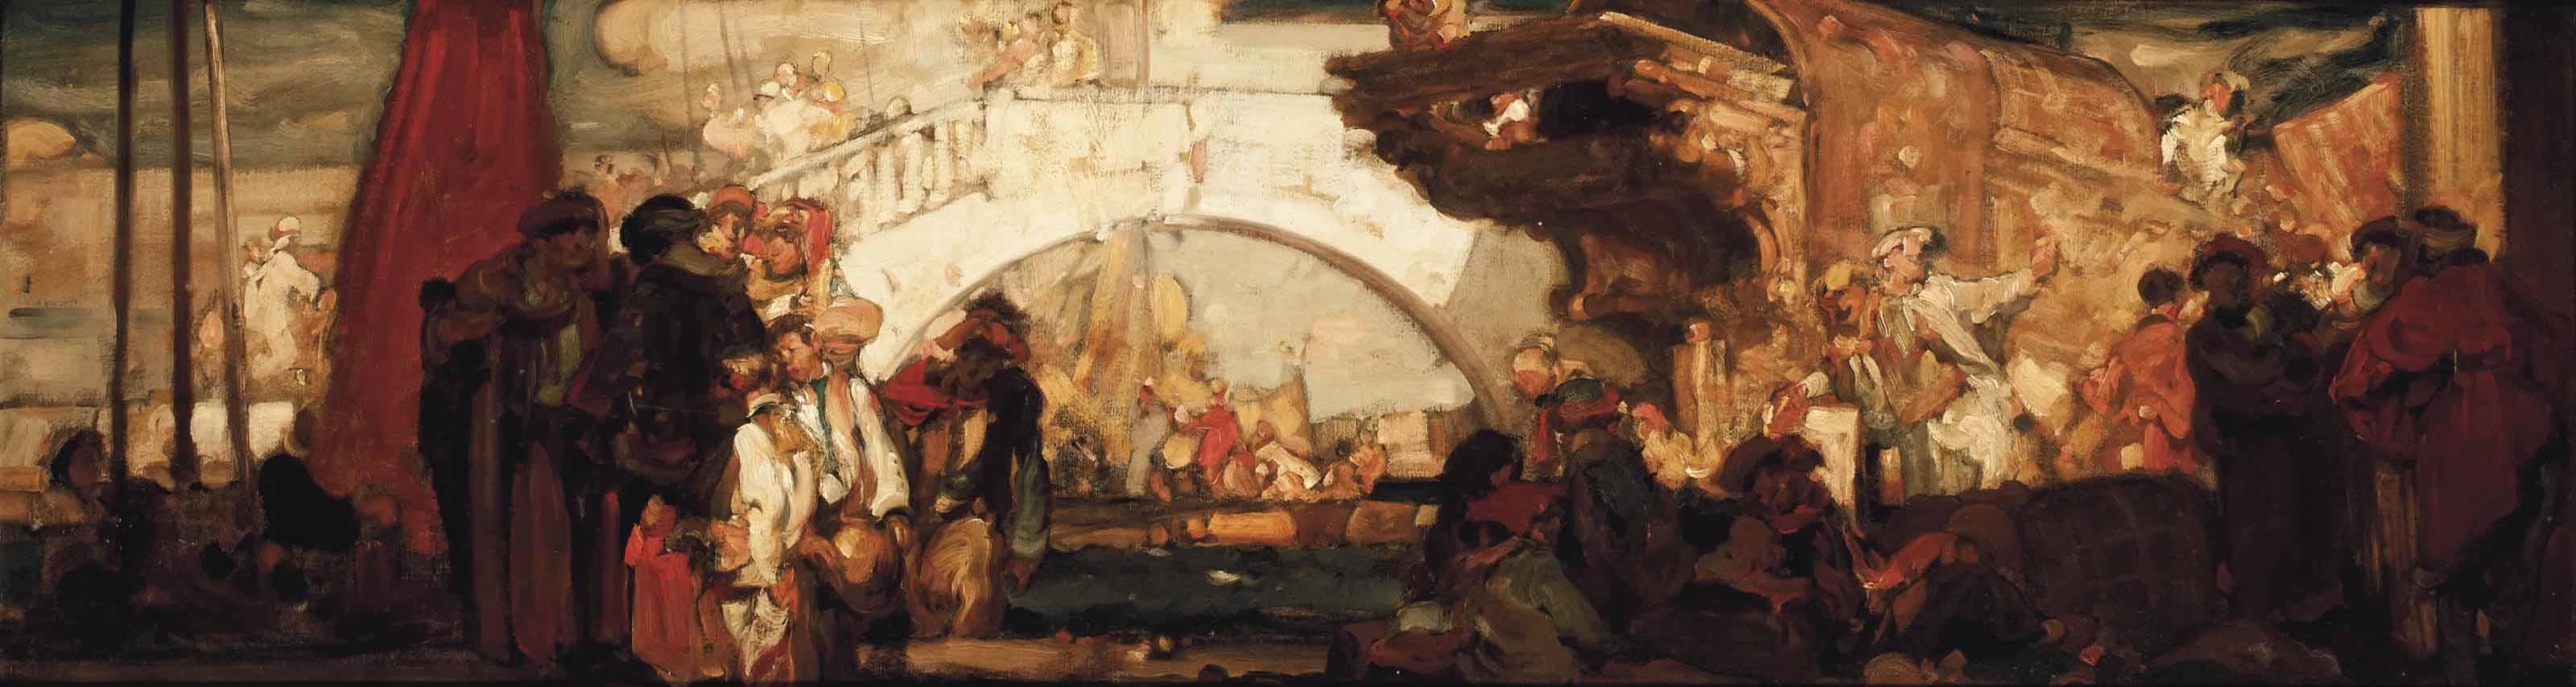 Marco Polo's arrival in Venice